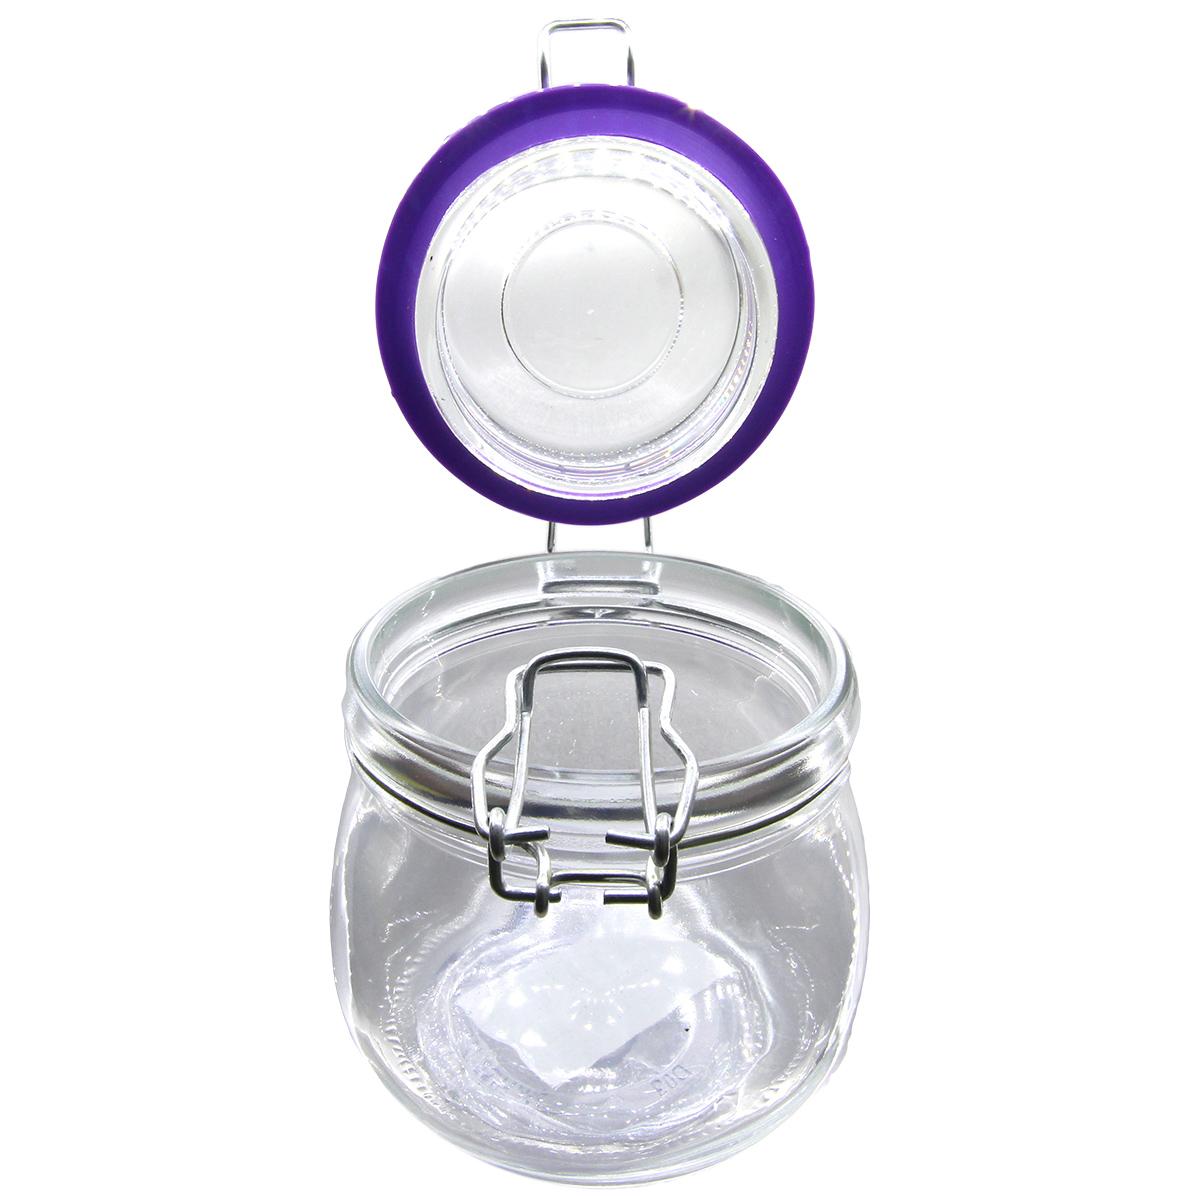 Pote hermético vidro Cancun Color lilás 520ml 11x10cm Lyor